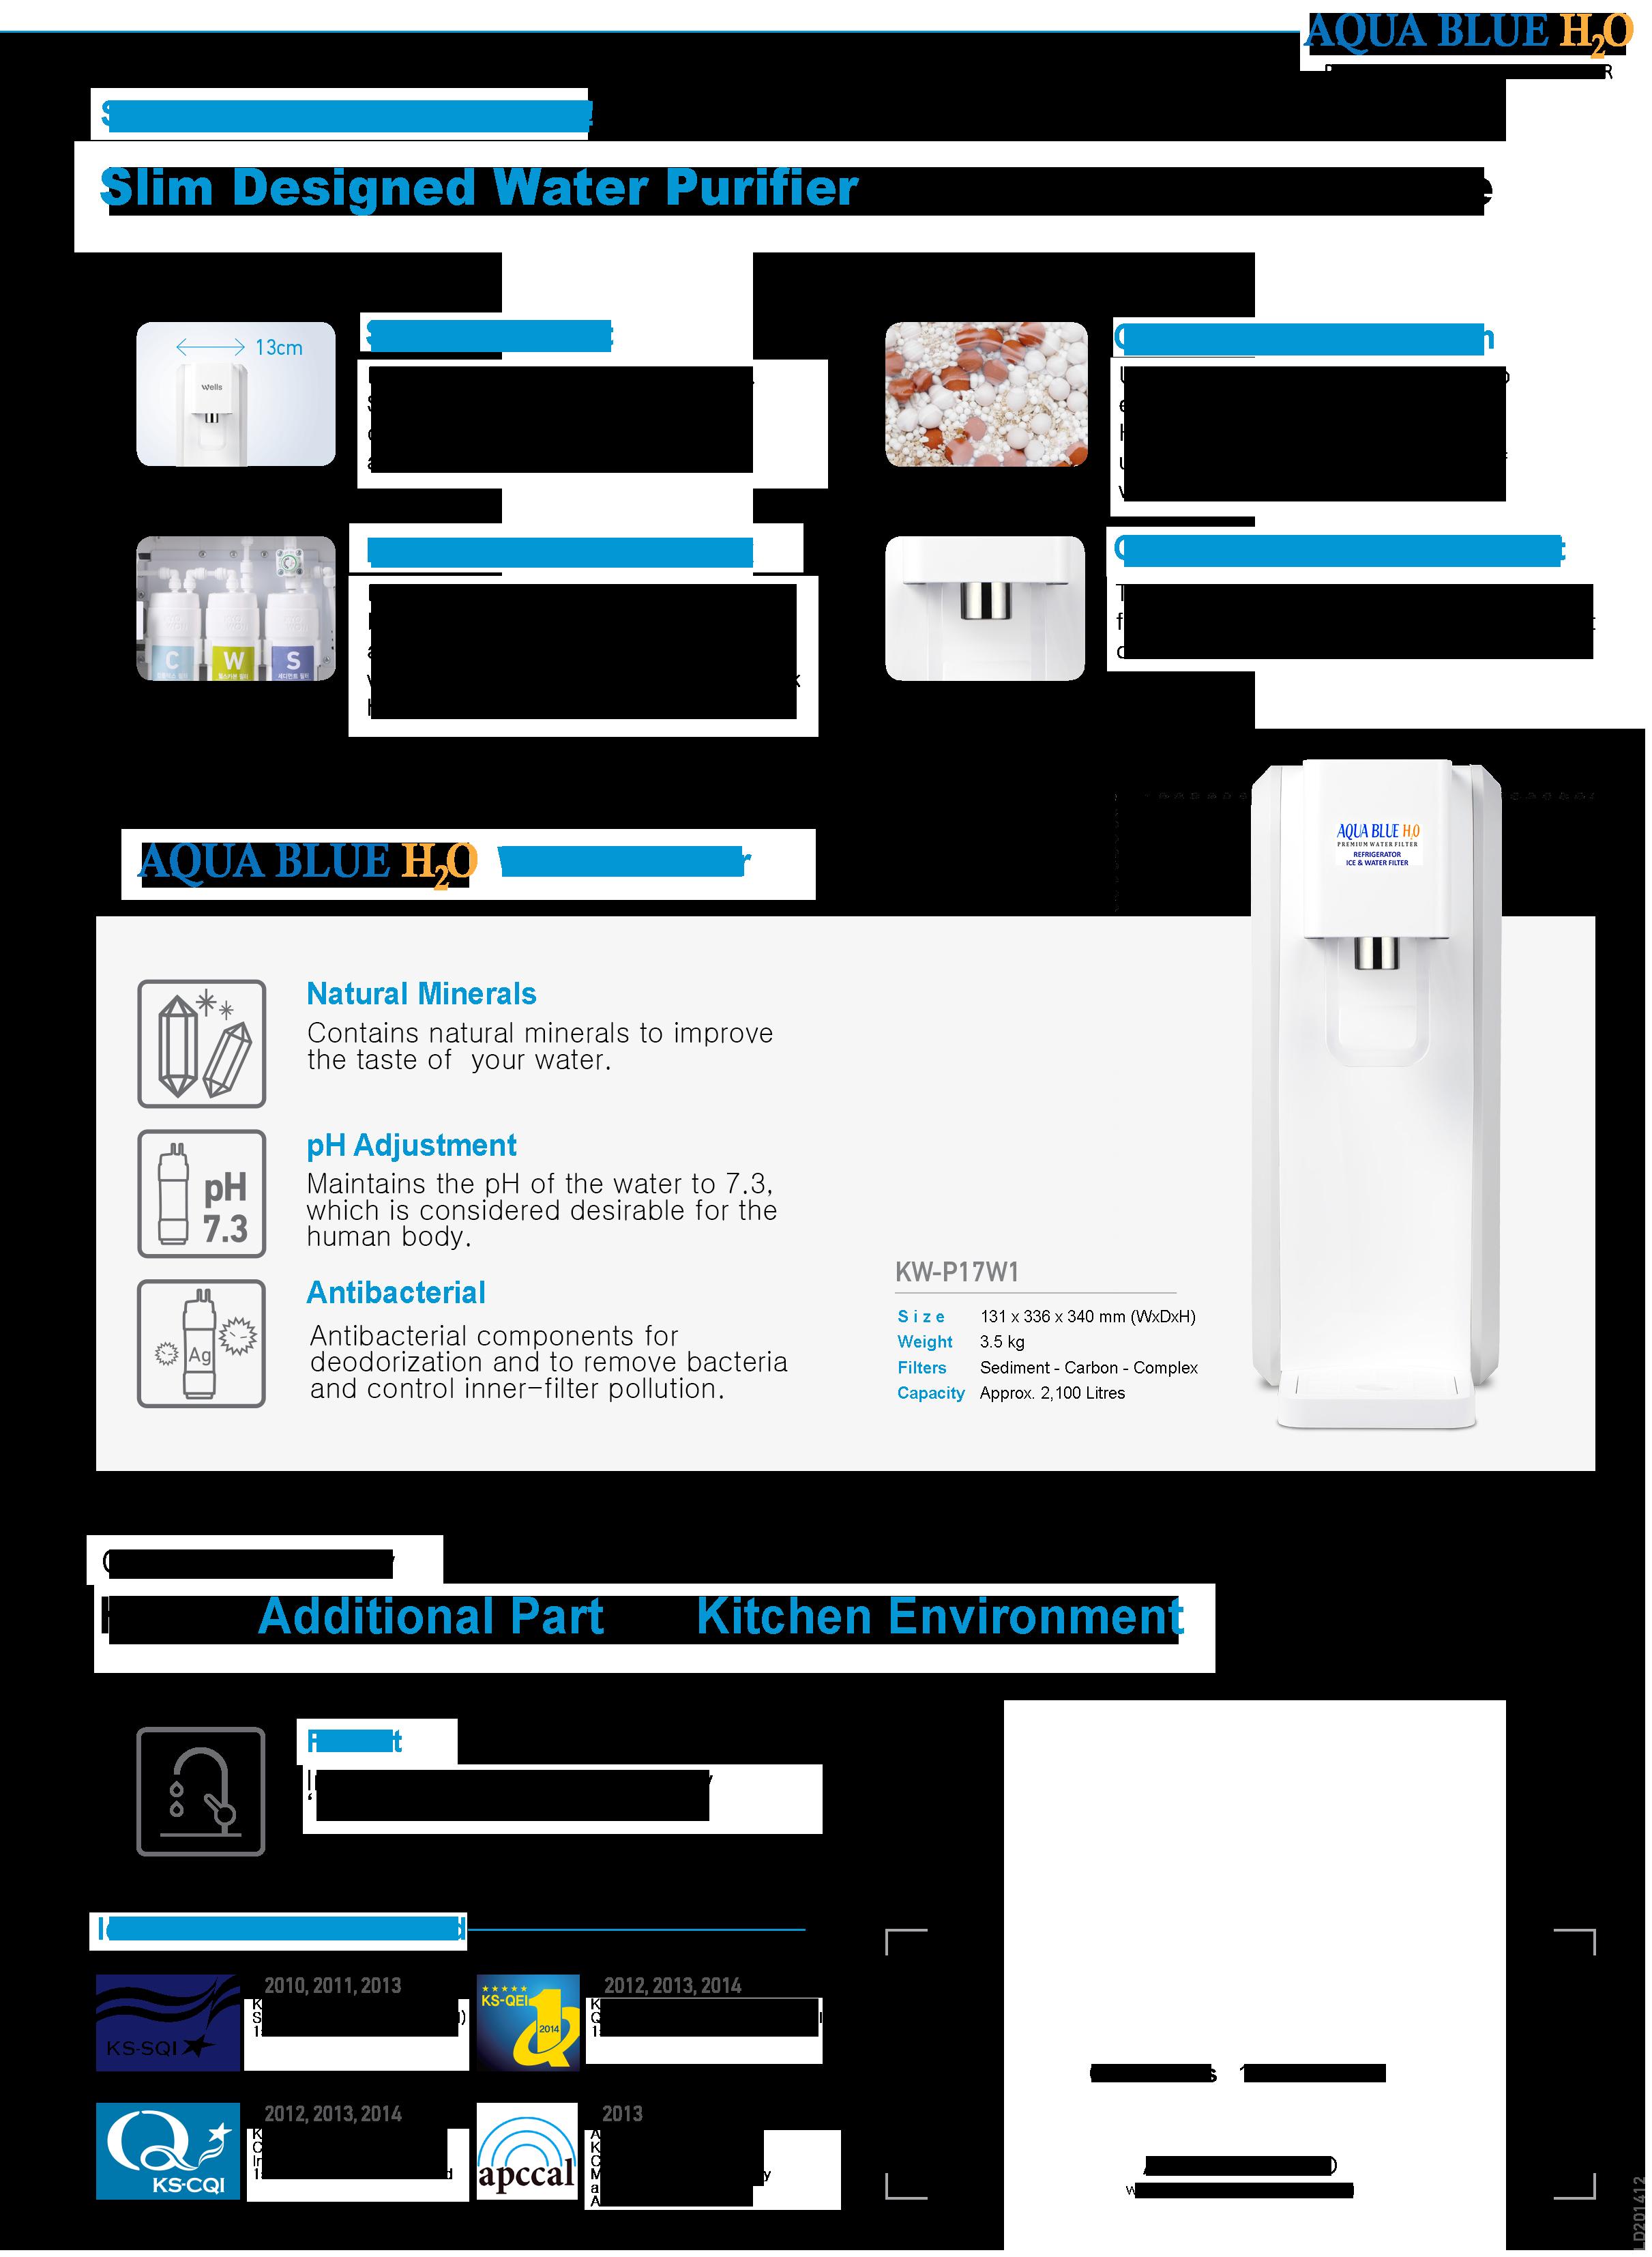 KW-P17W1_catalog-AquaBlue-2.png